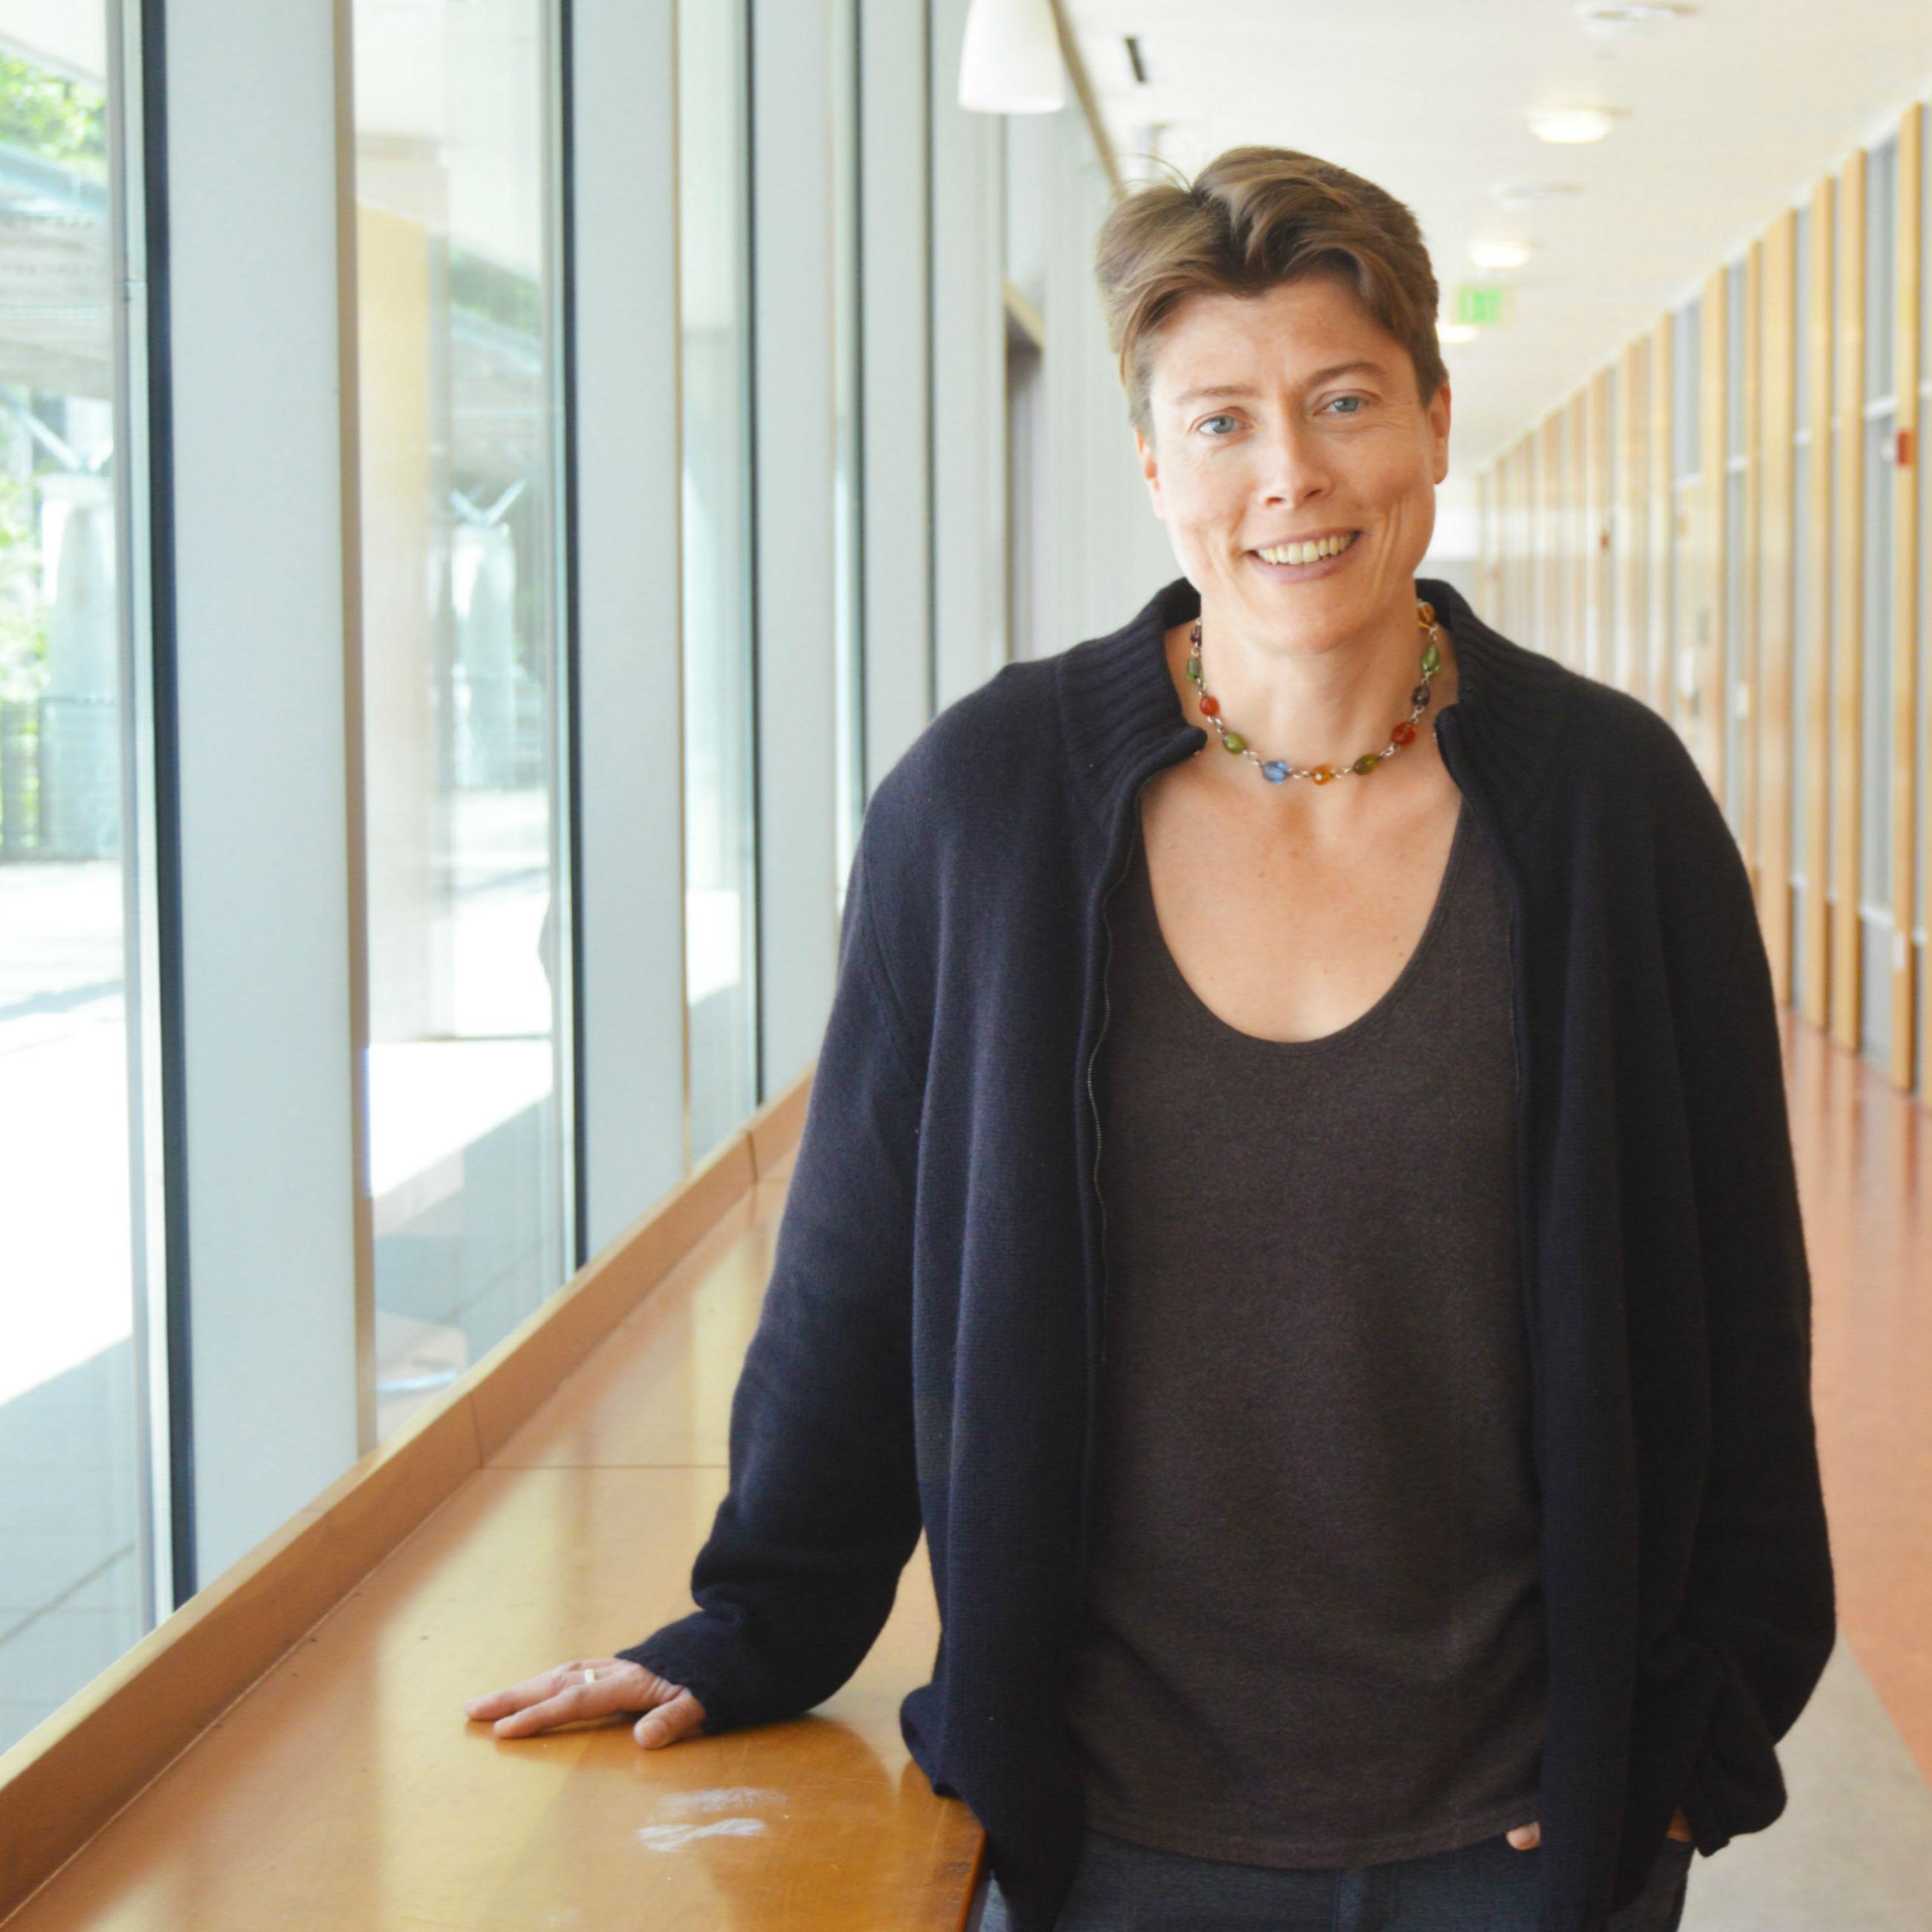 Professor Of Sociology At UC-Santa Cruz